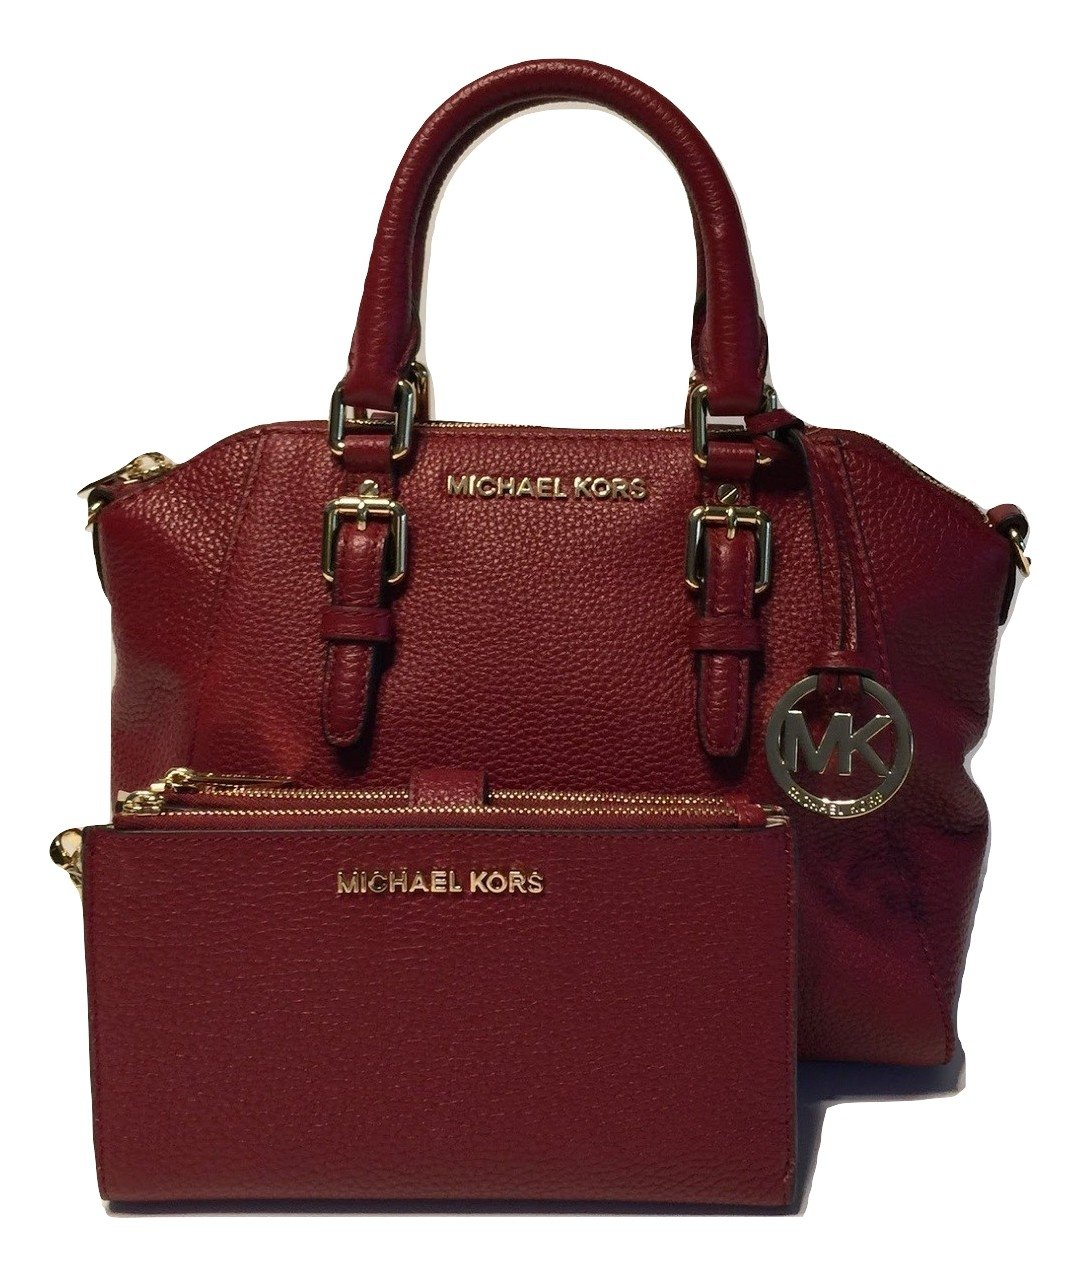 MICHAEL Michael Kors Ciara MD Messenger Handbag bundled with Michael Kors Jet Set Travel Double Zip Wallet Wristlet (Cherry)